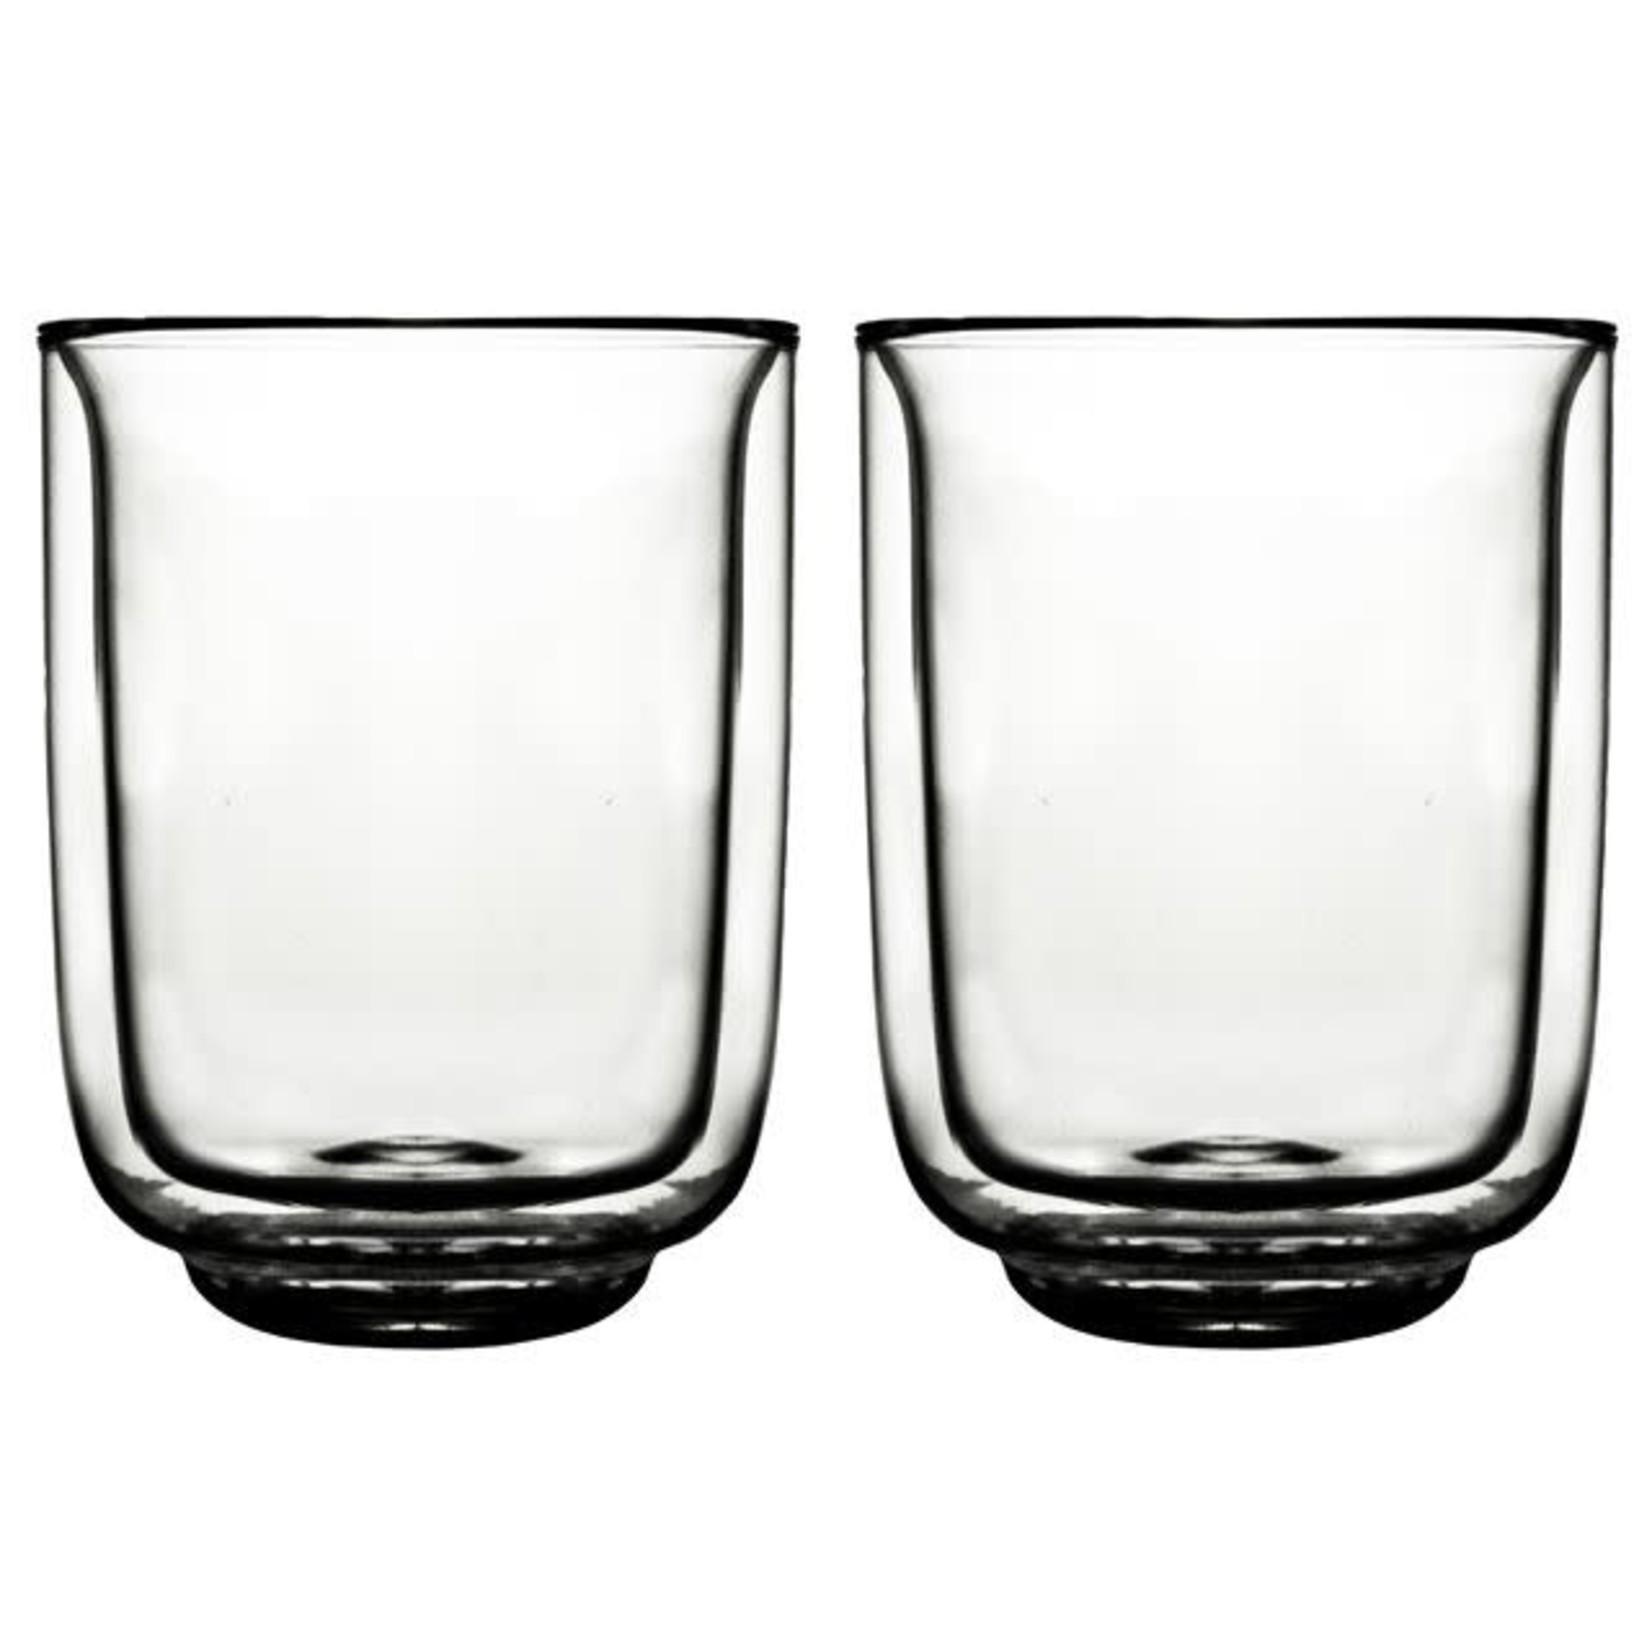 Gusta Dubbelwandig Glas FIKA 325ml per stuk